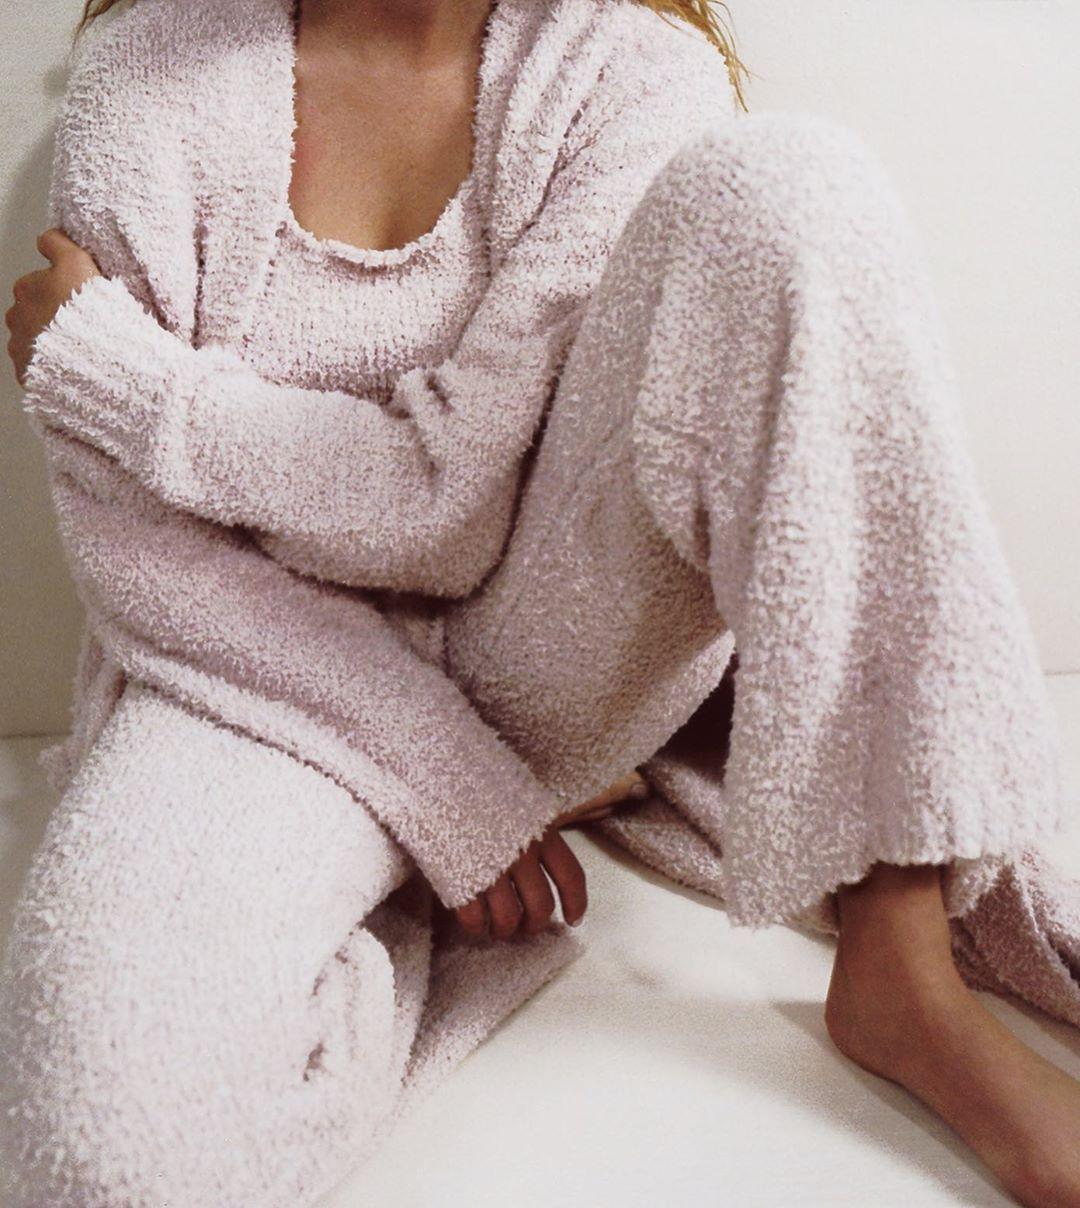 skims-loungewear-december-2019 (1)